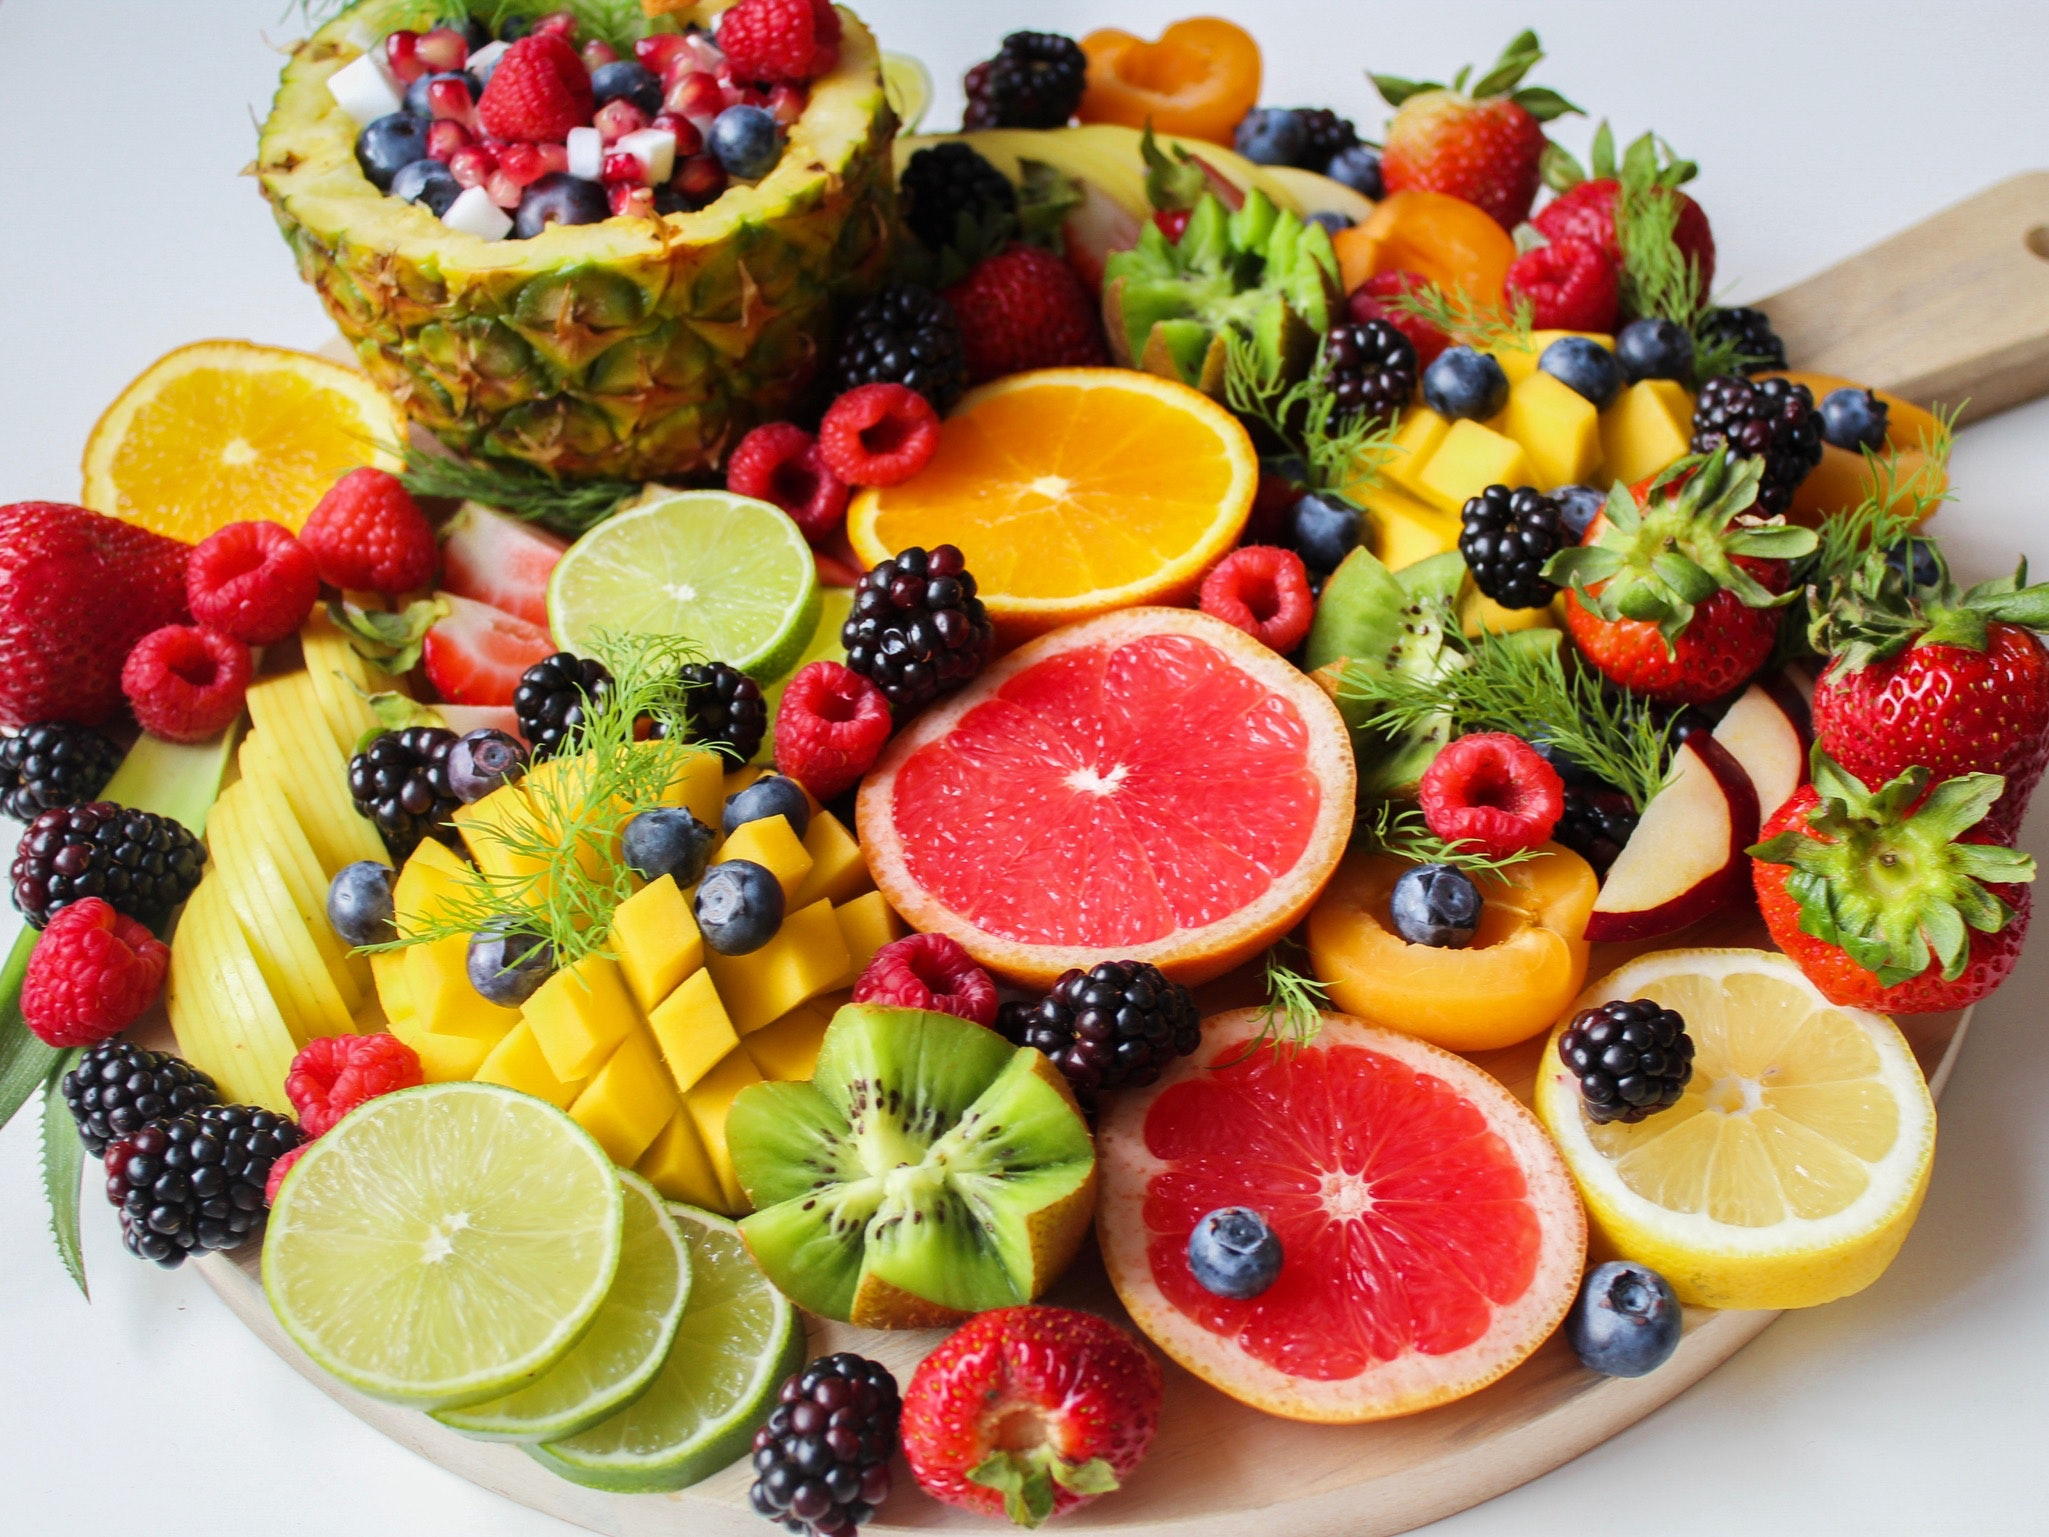 Fruit + LCHF = ?!?!?! -